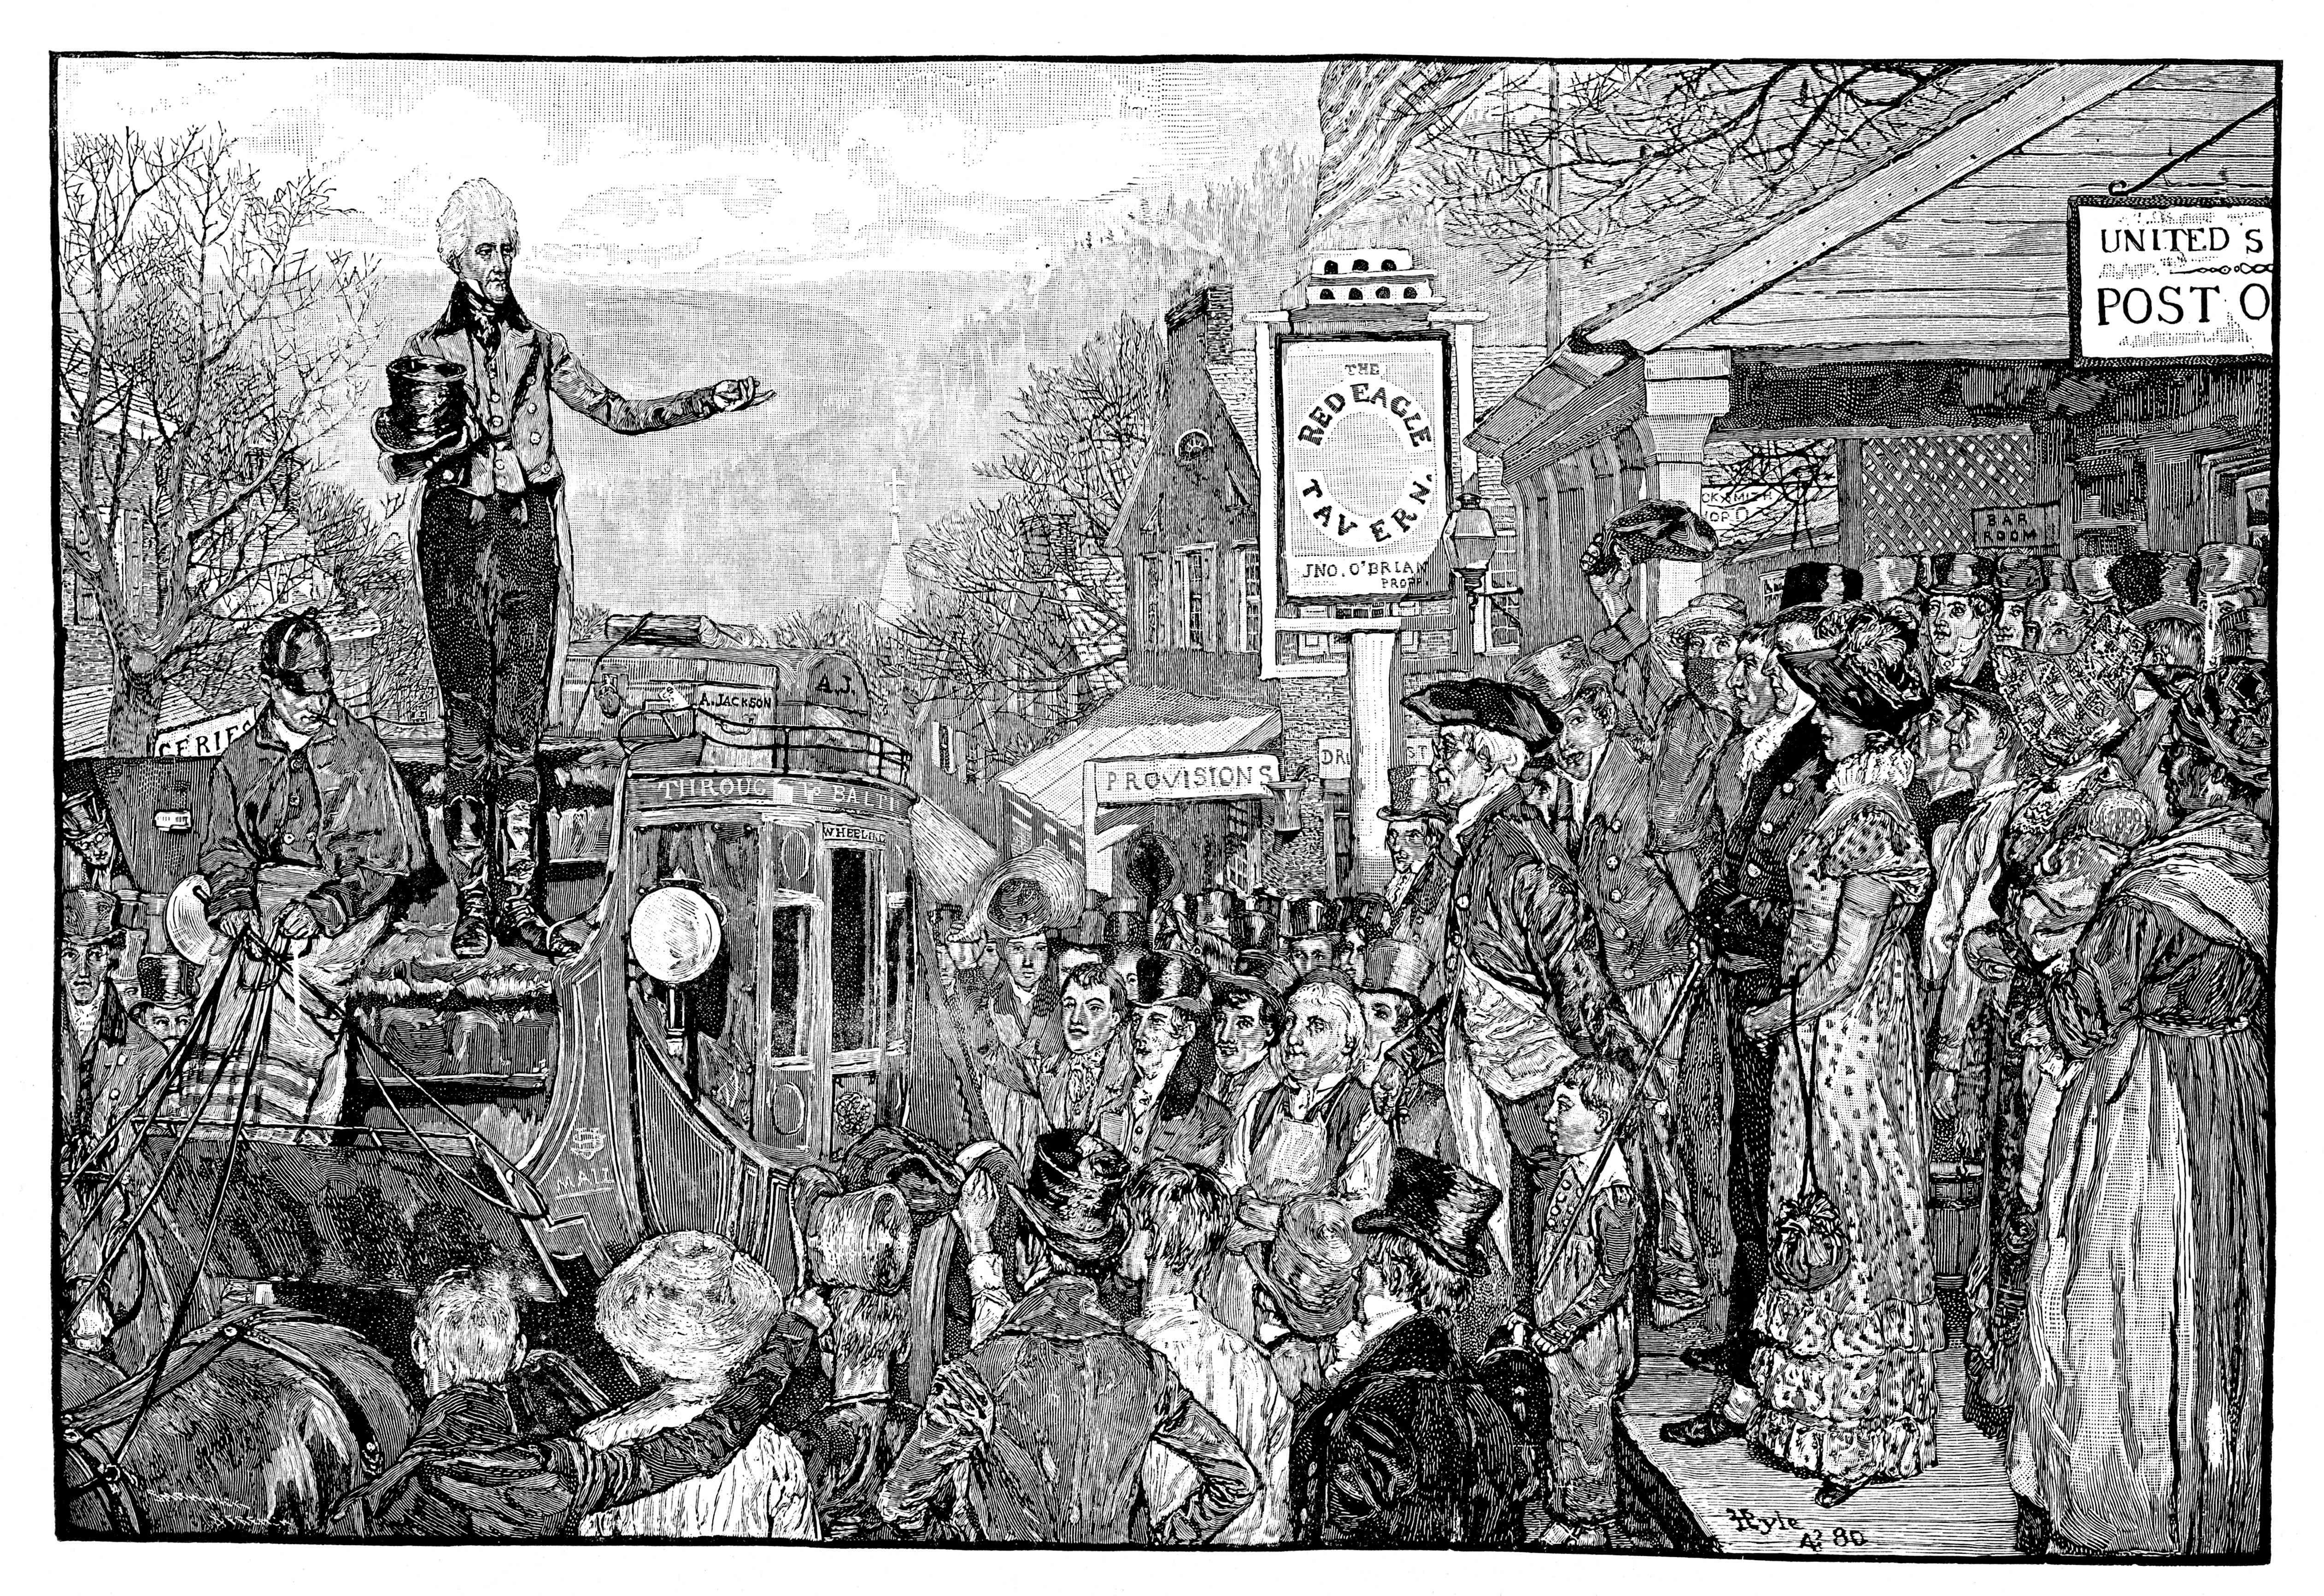 Andrew Jackson (1767-1845), 7th president of the USA, Washington, USA, 1828, (1881).